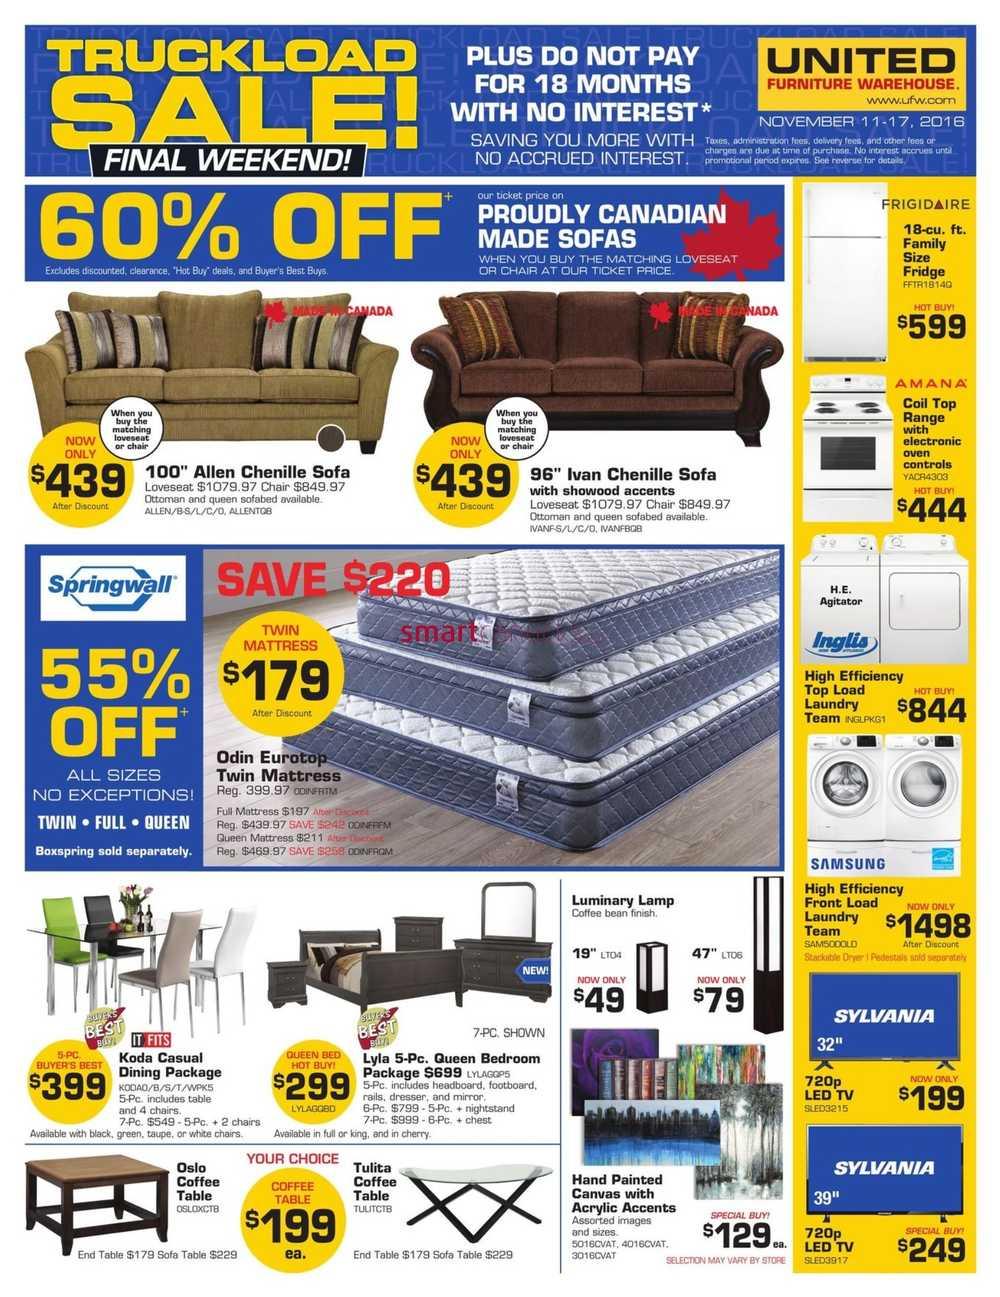 united furniture warehouse flyer november 11 to 17